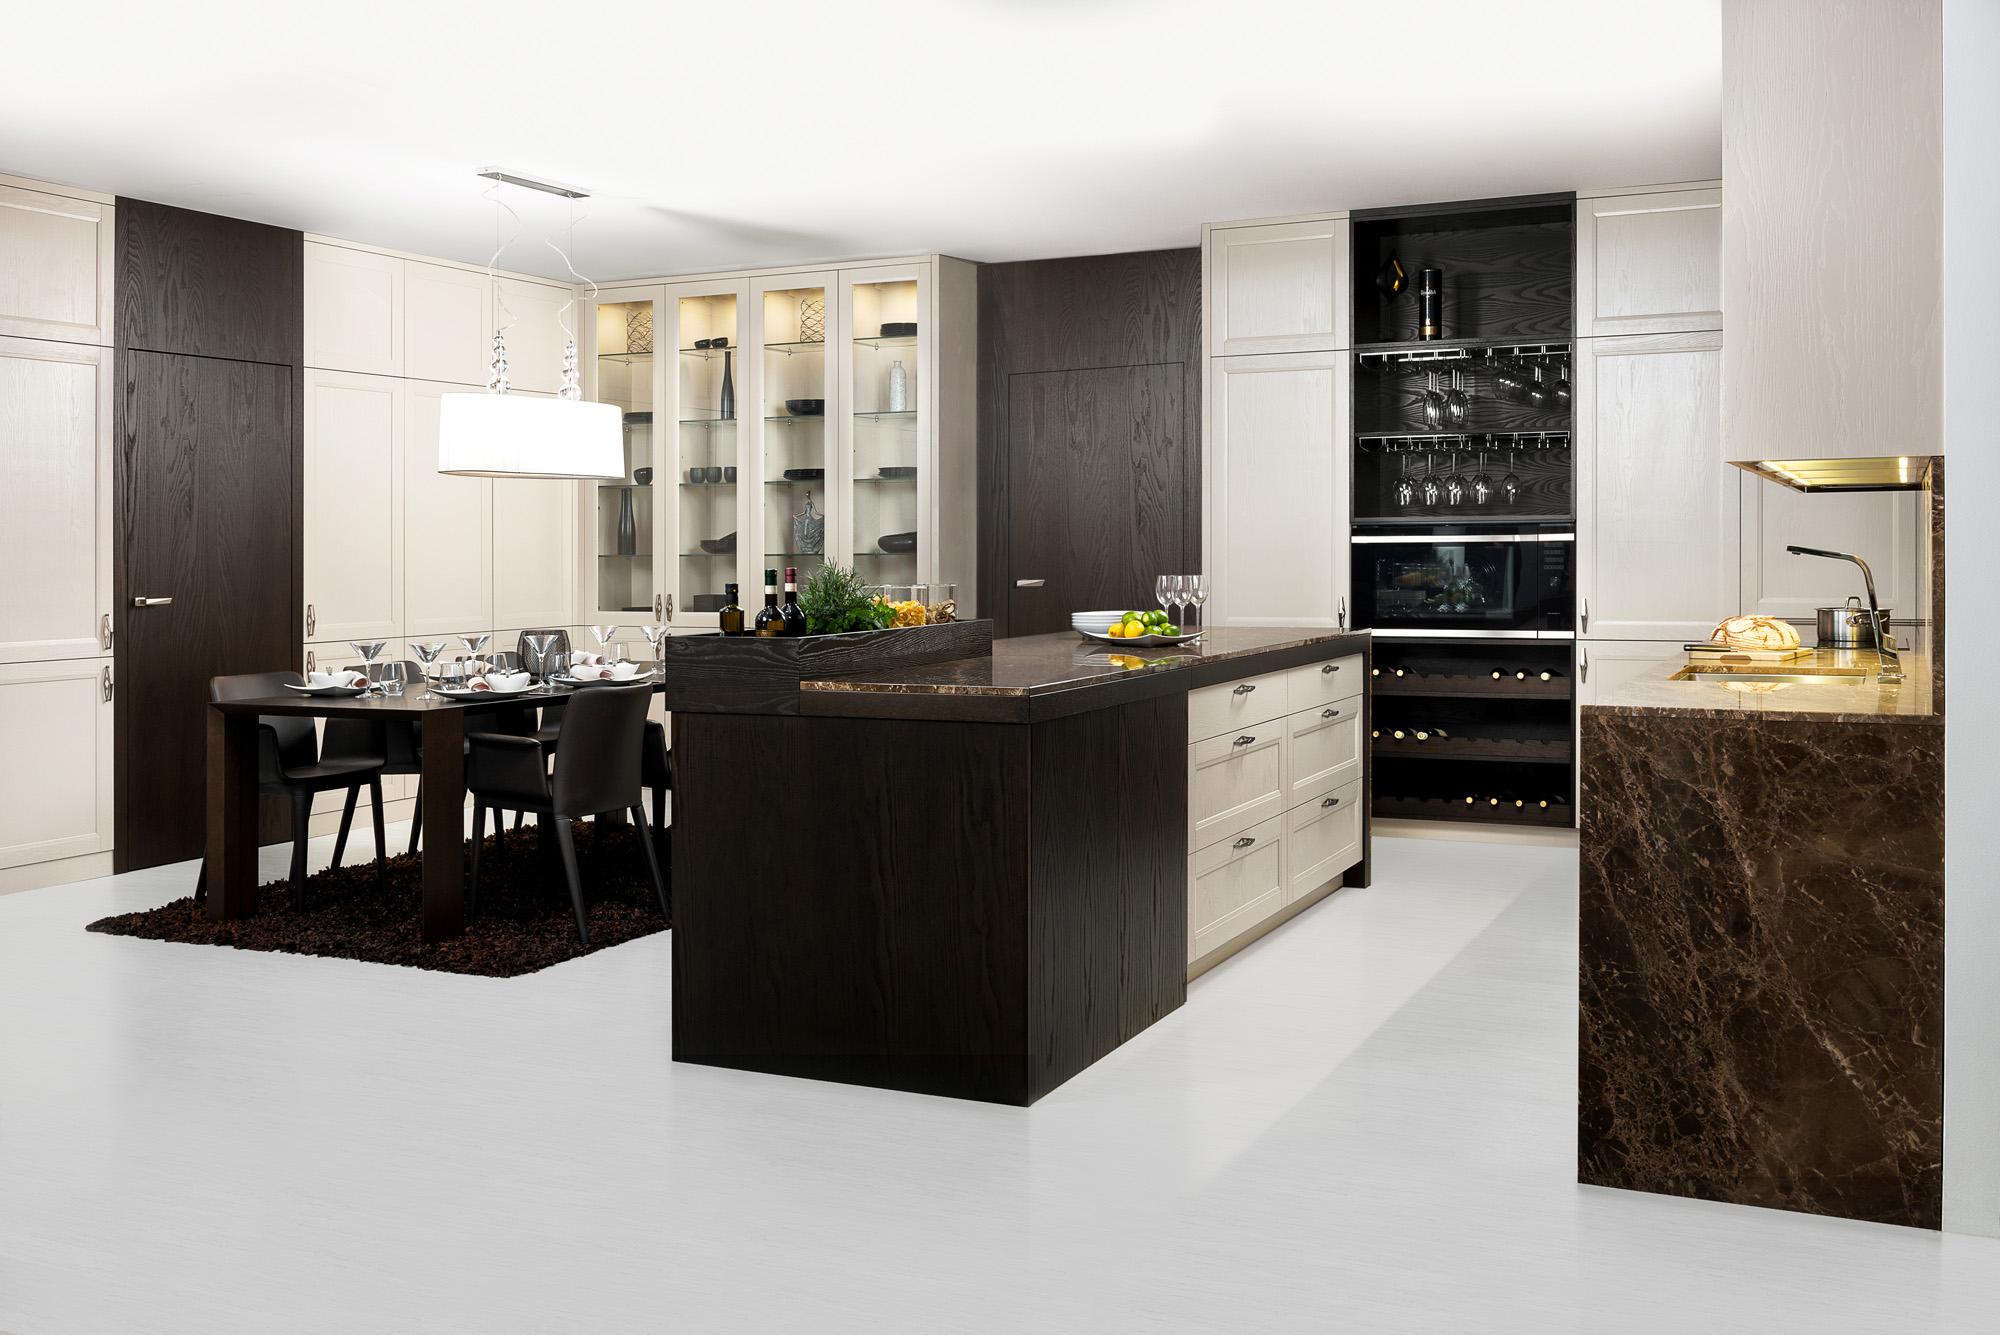 Incroyable Bentons Kitchens